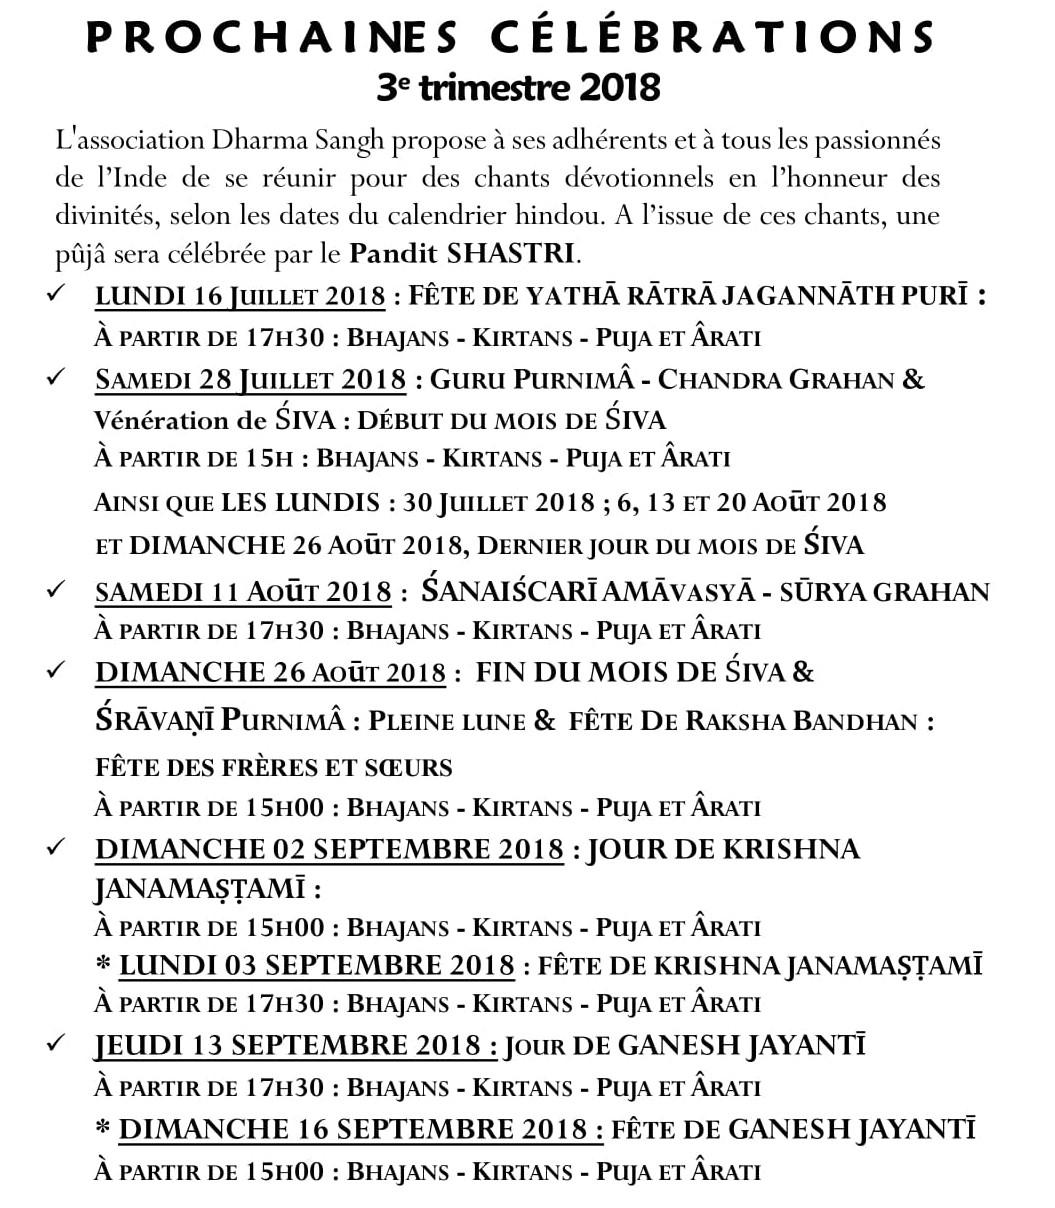 CELEBRATIONS Fetes 3eme trimestre 2018-1